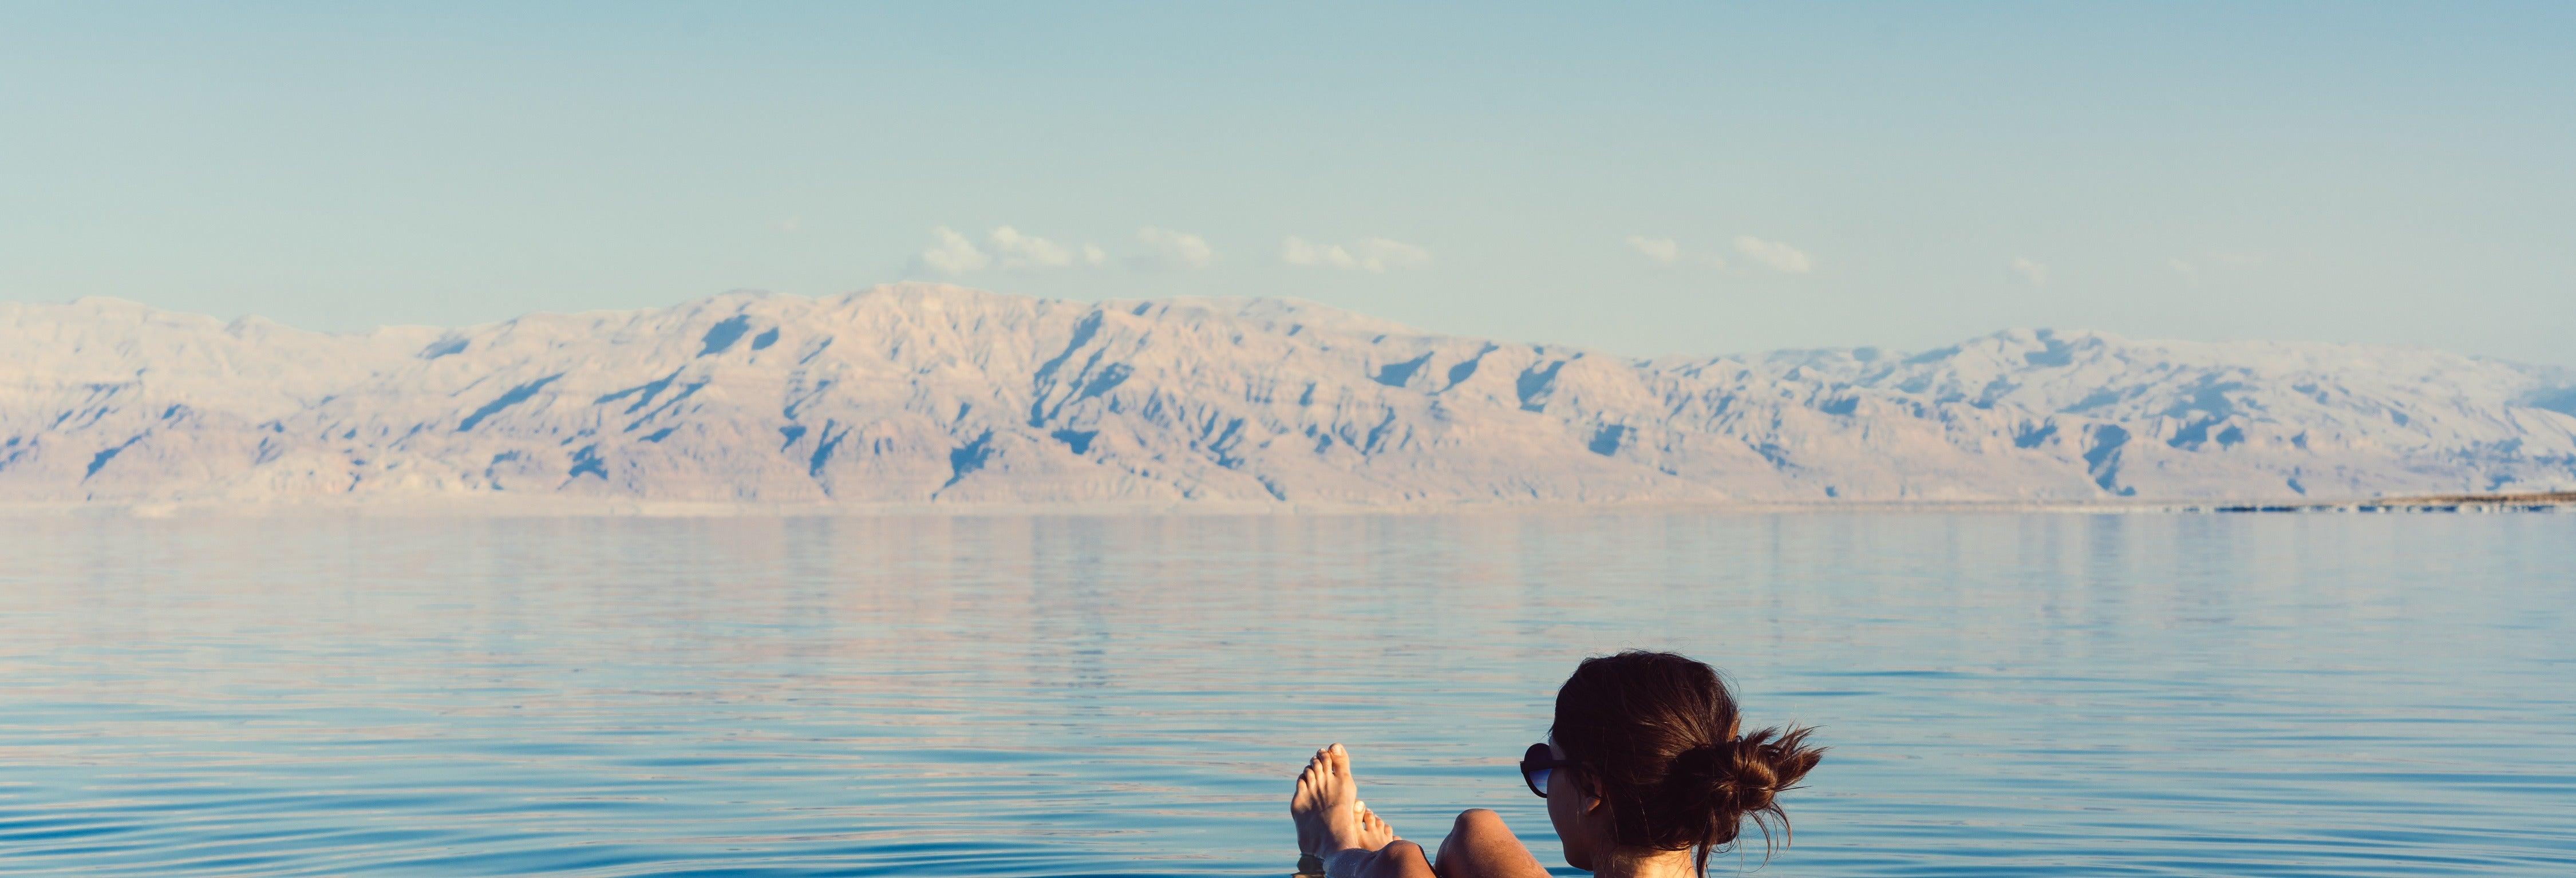 Mar Muerto, Madaba y Monte Nebo